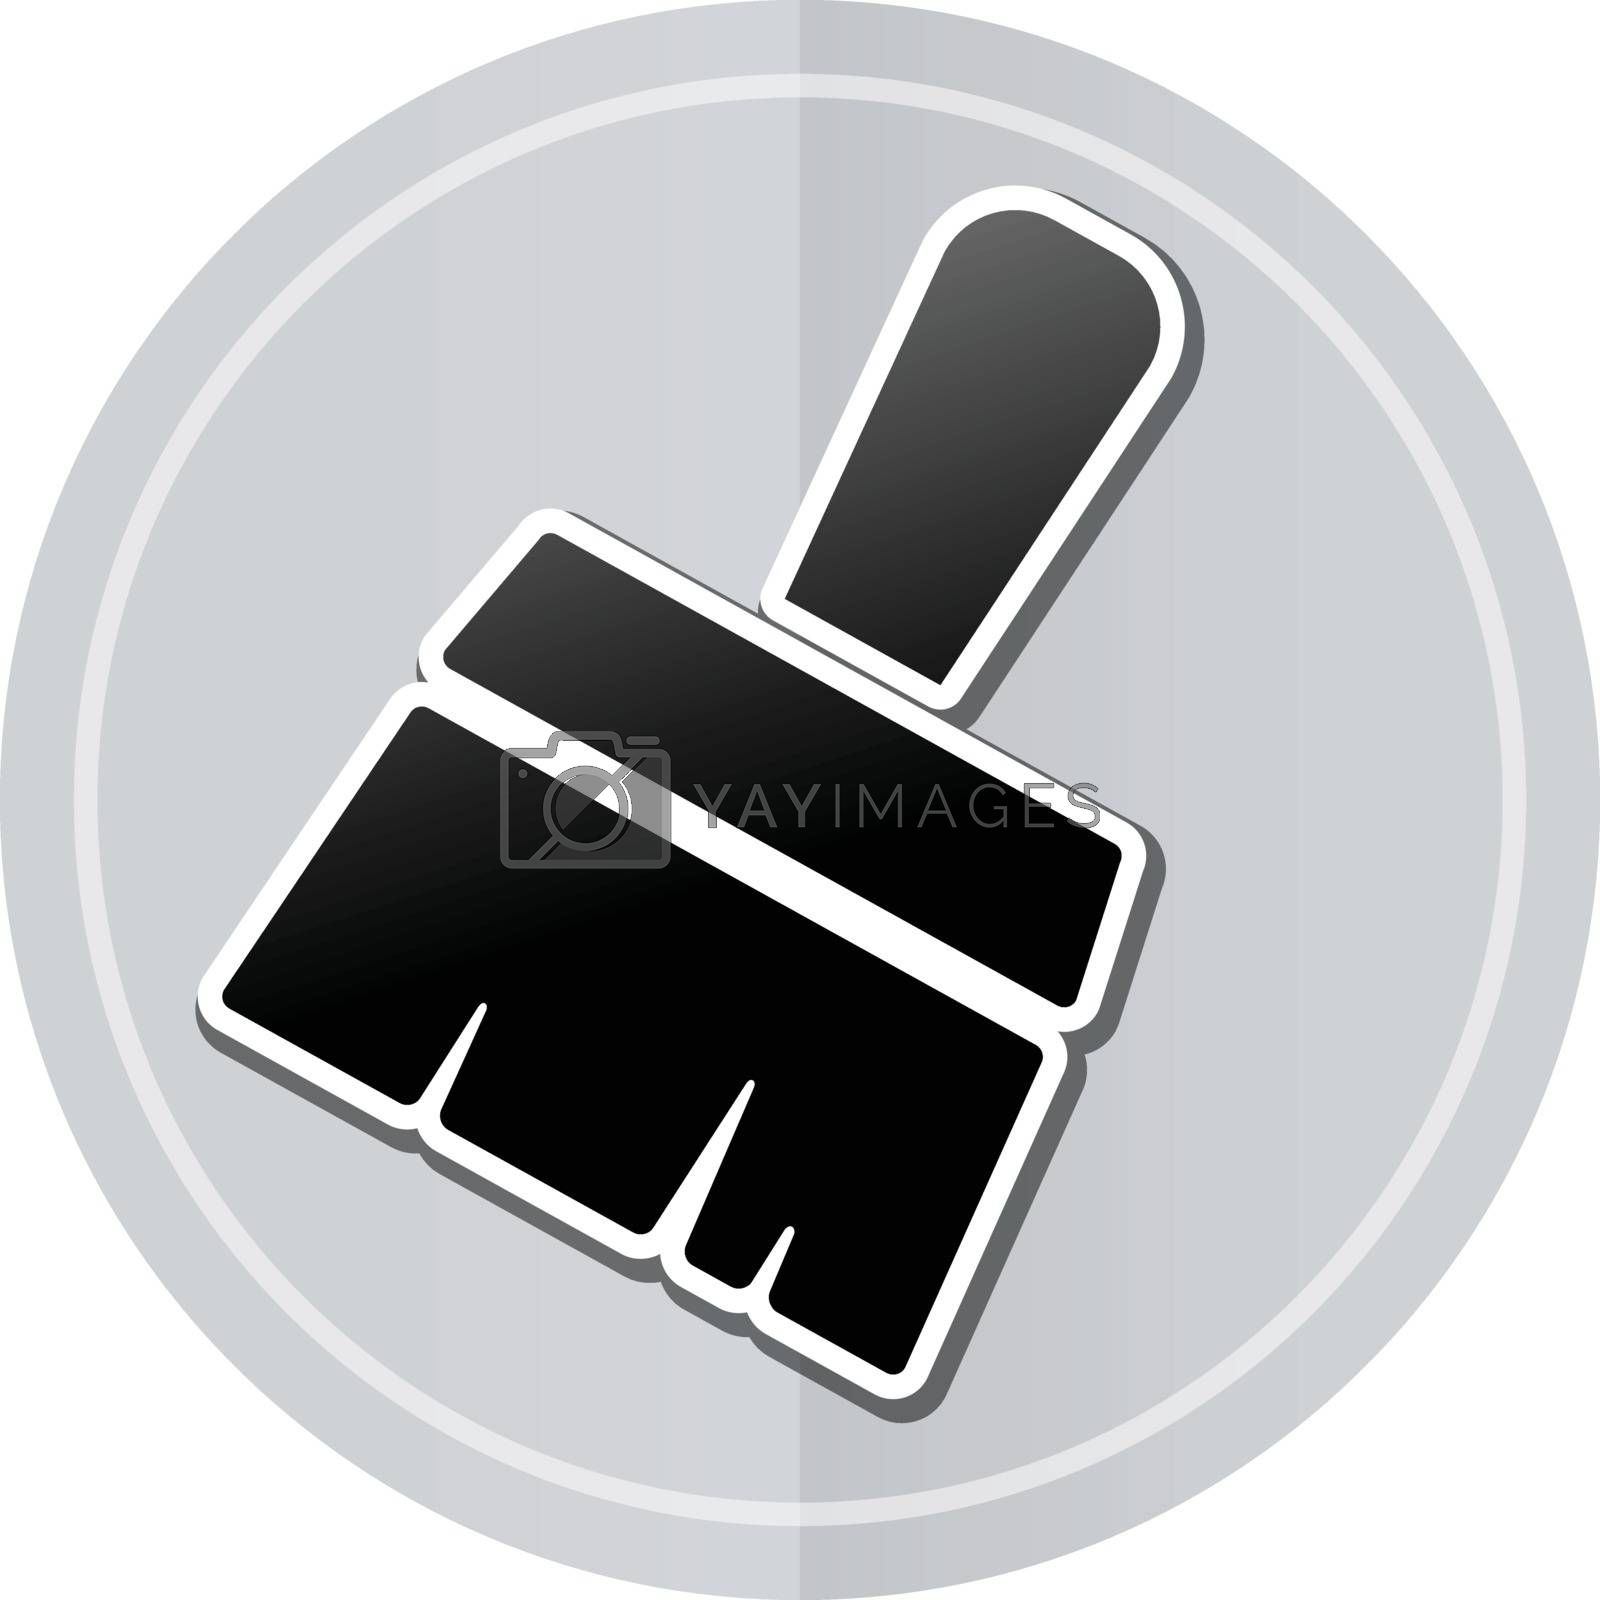 Illustration of paintbrush sticker icon simple design